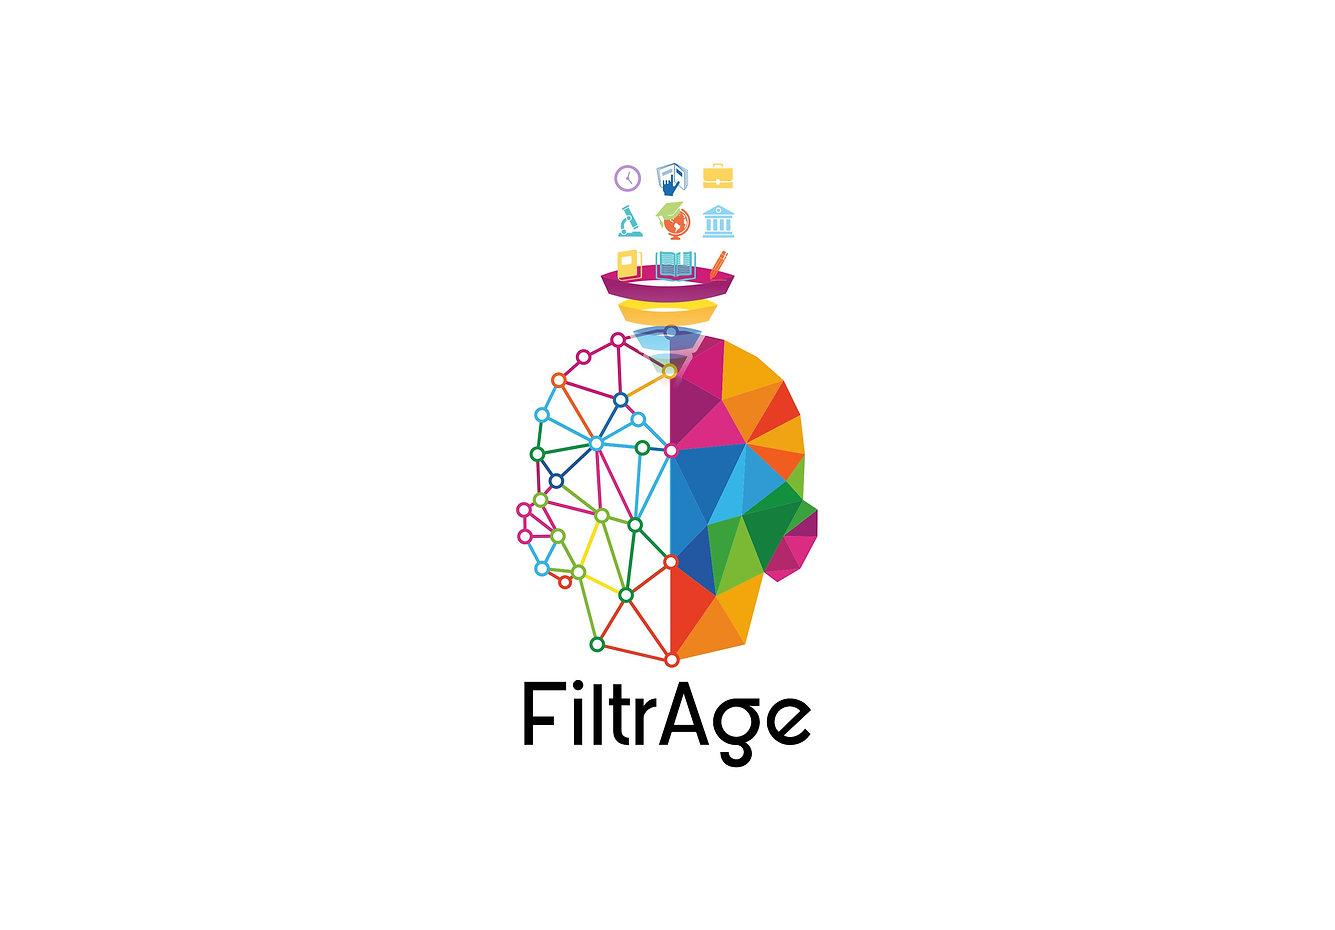 FiltrAge_logo.jpg